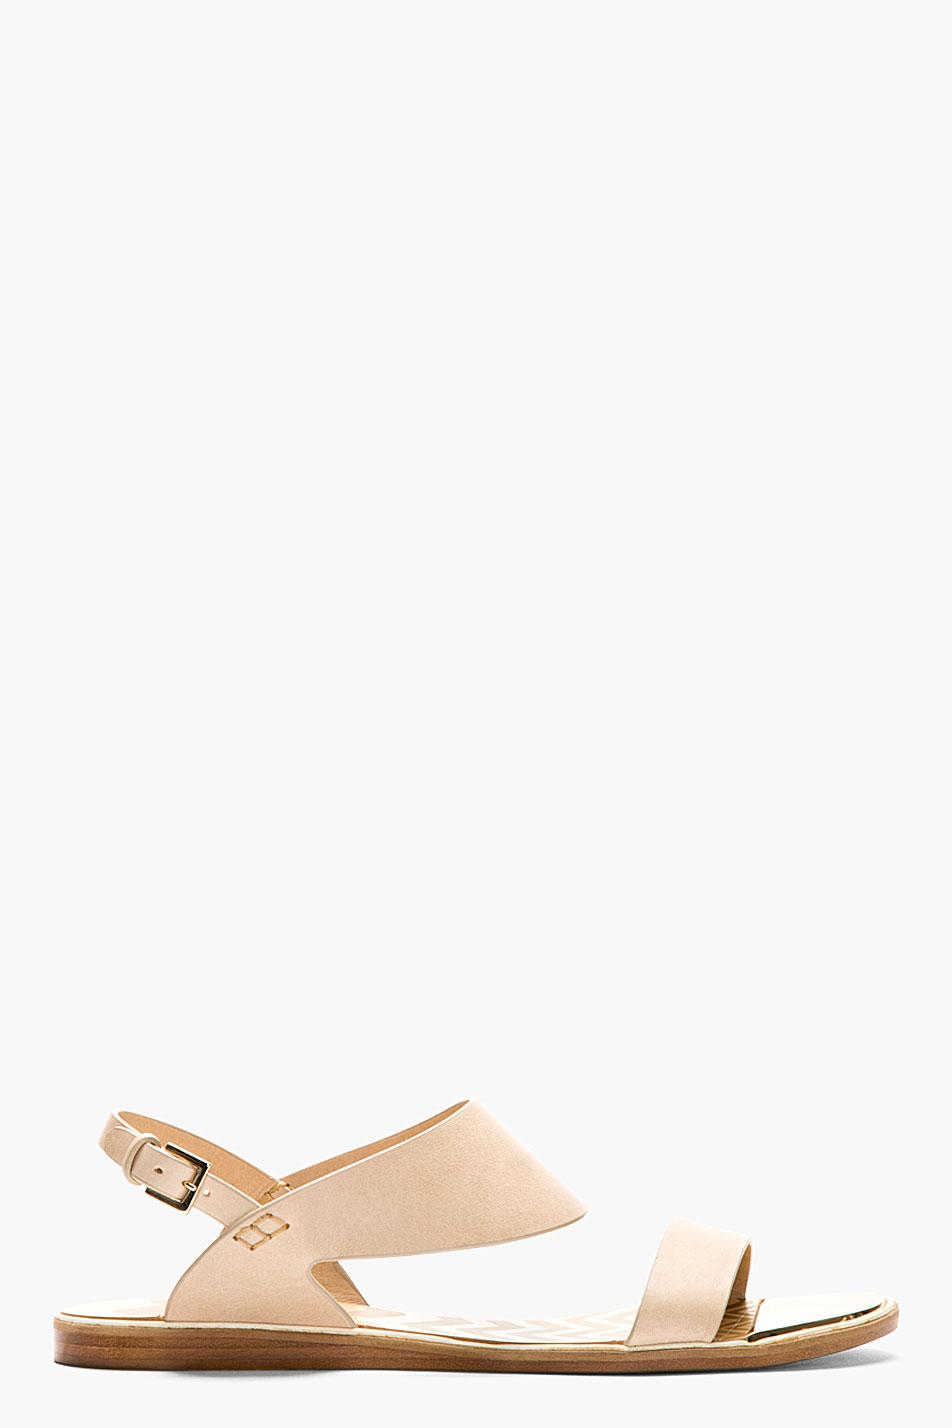 Nicholas kirkwood beige flat sandals